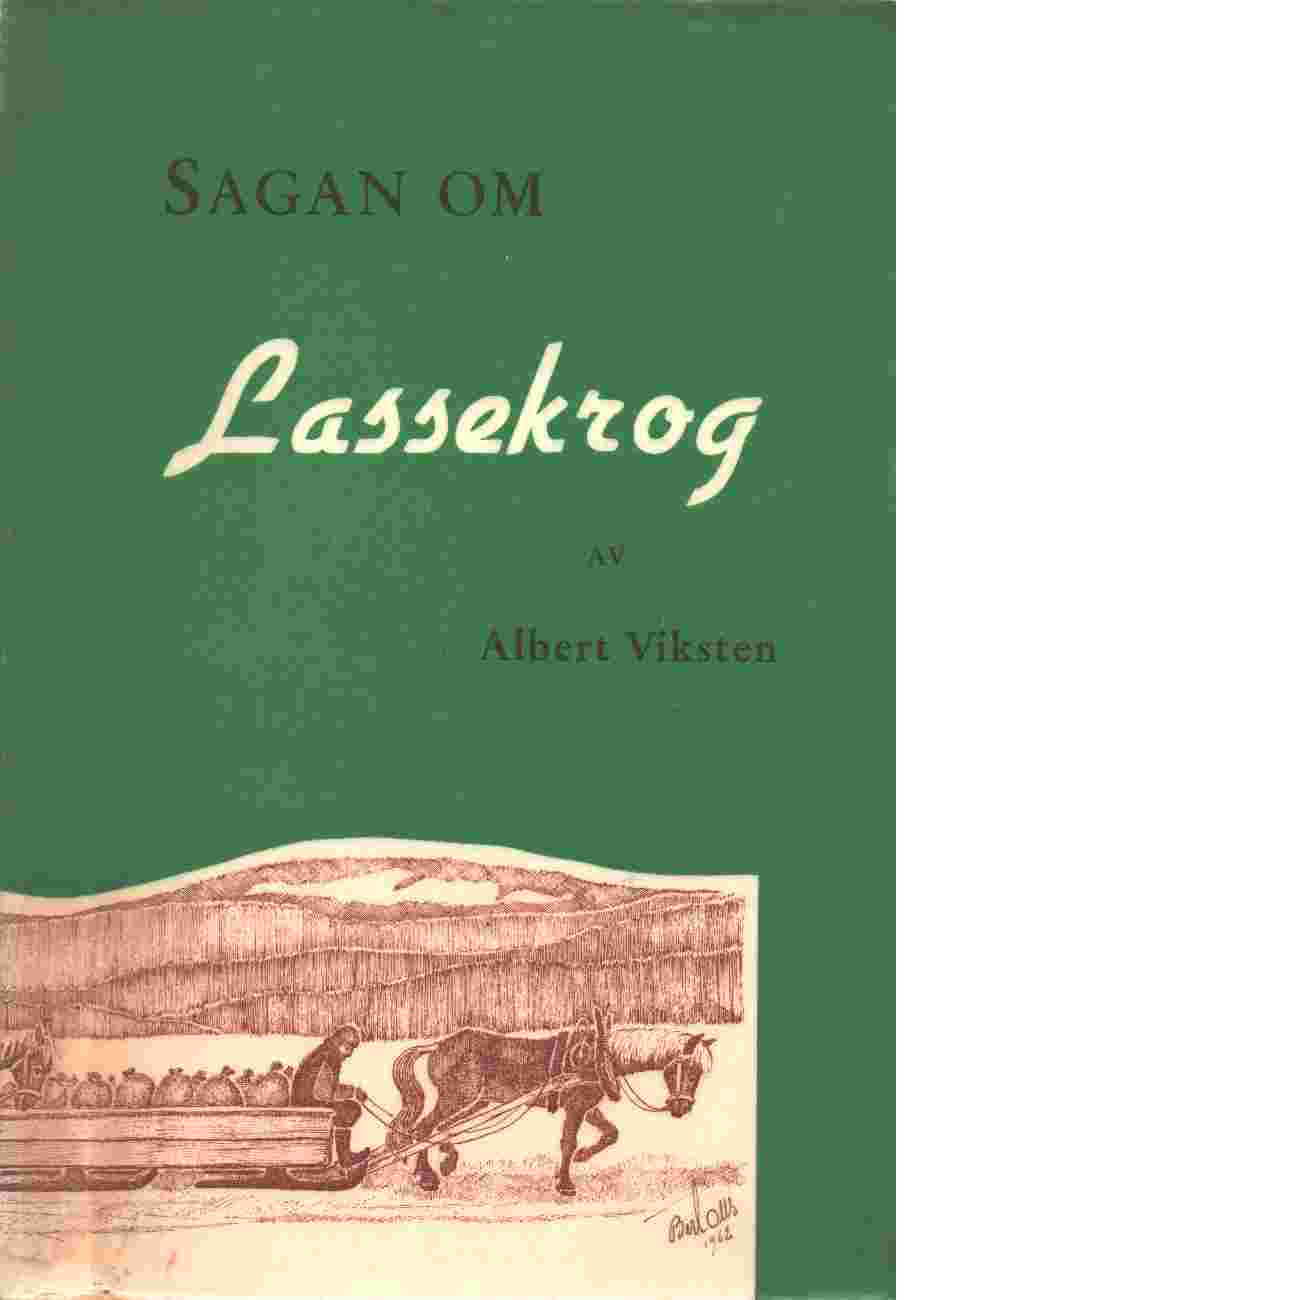 Sagan om Lassekrog - Red. Viksten, Albert